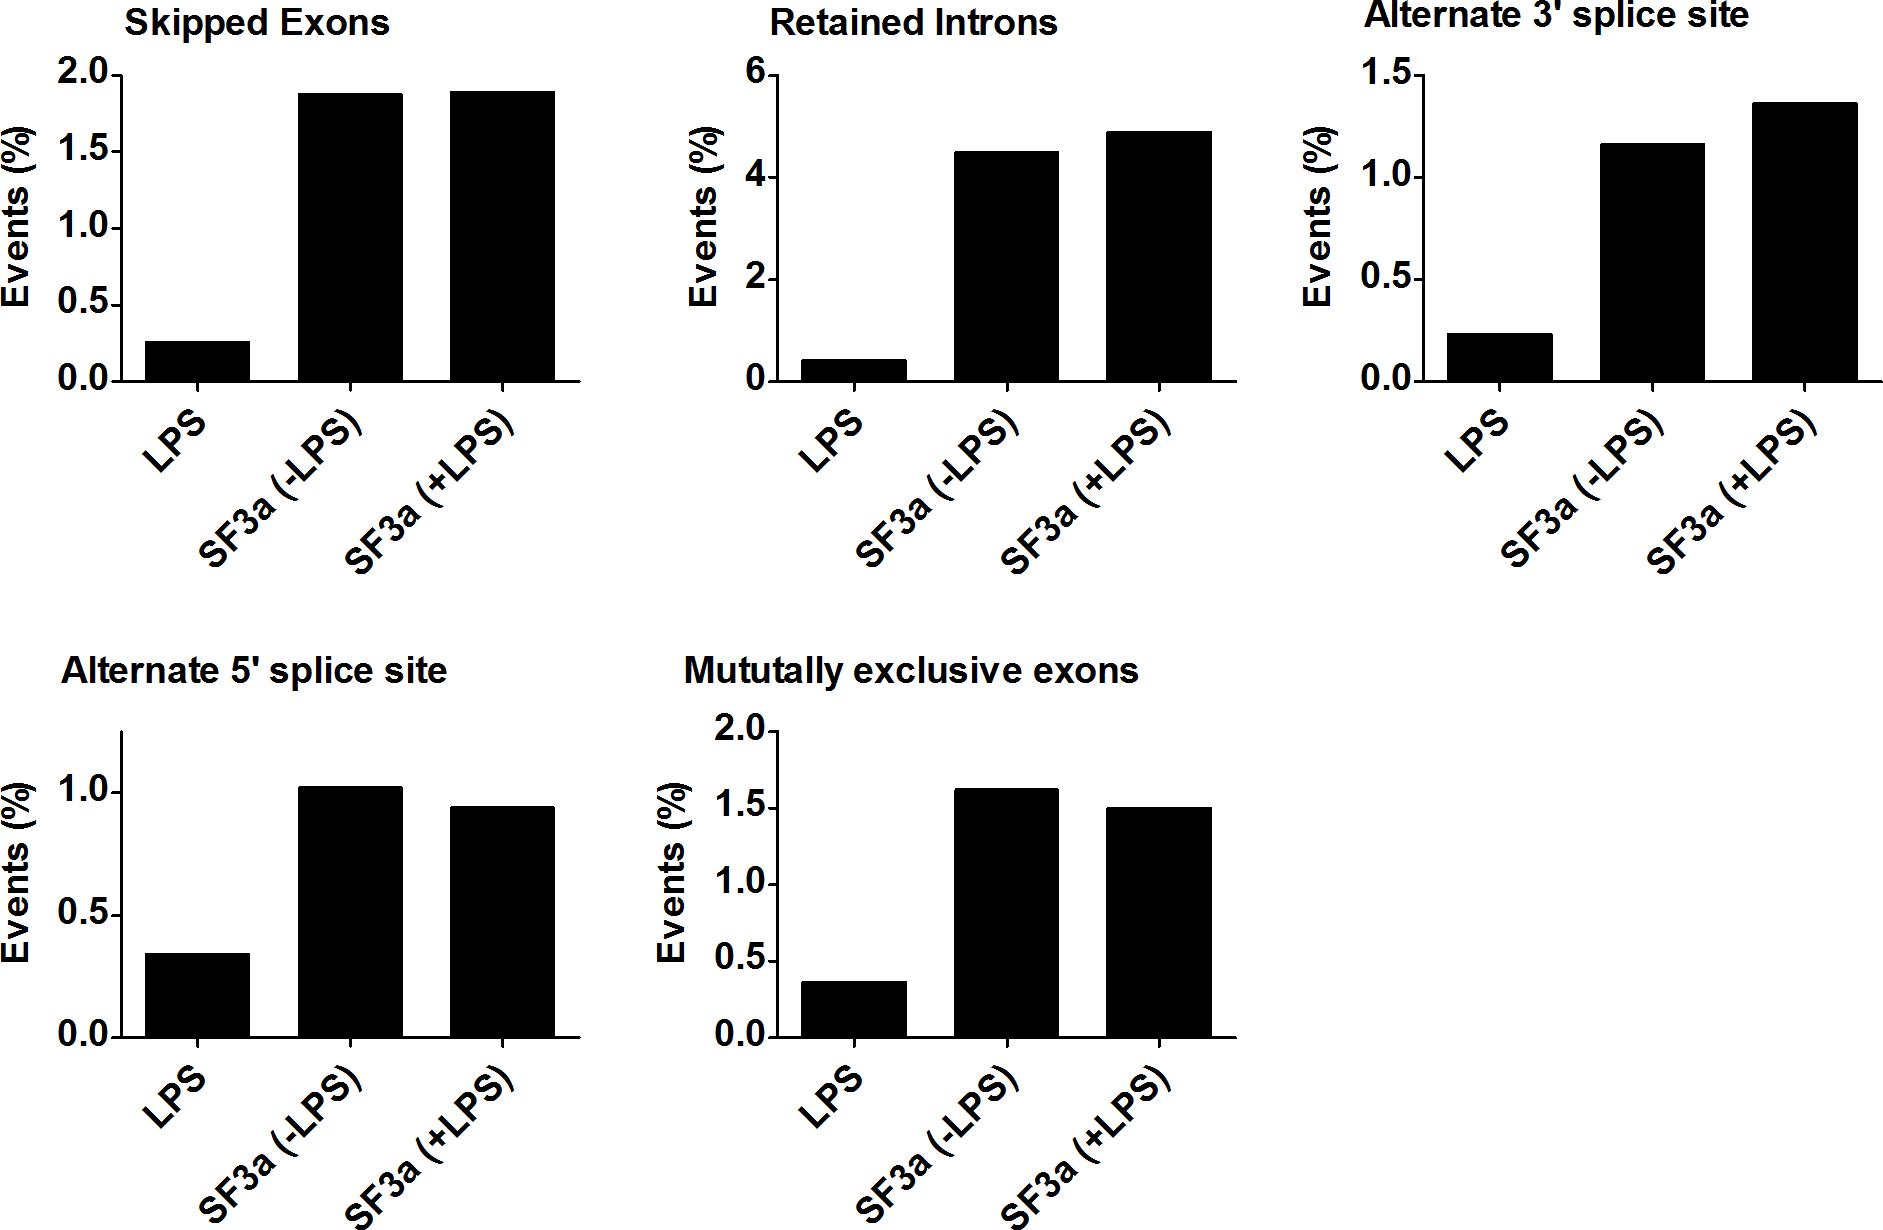 SF3a1 regulates multiple modes of alternative pre-mRNA splicing.